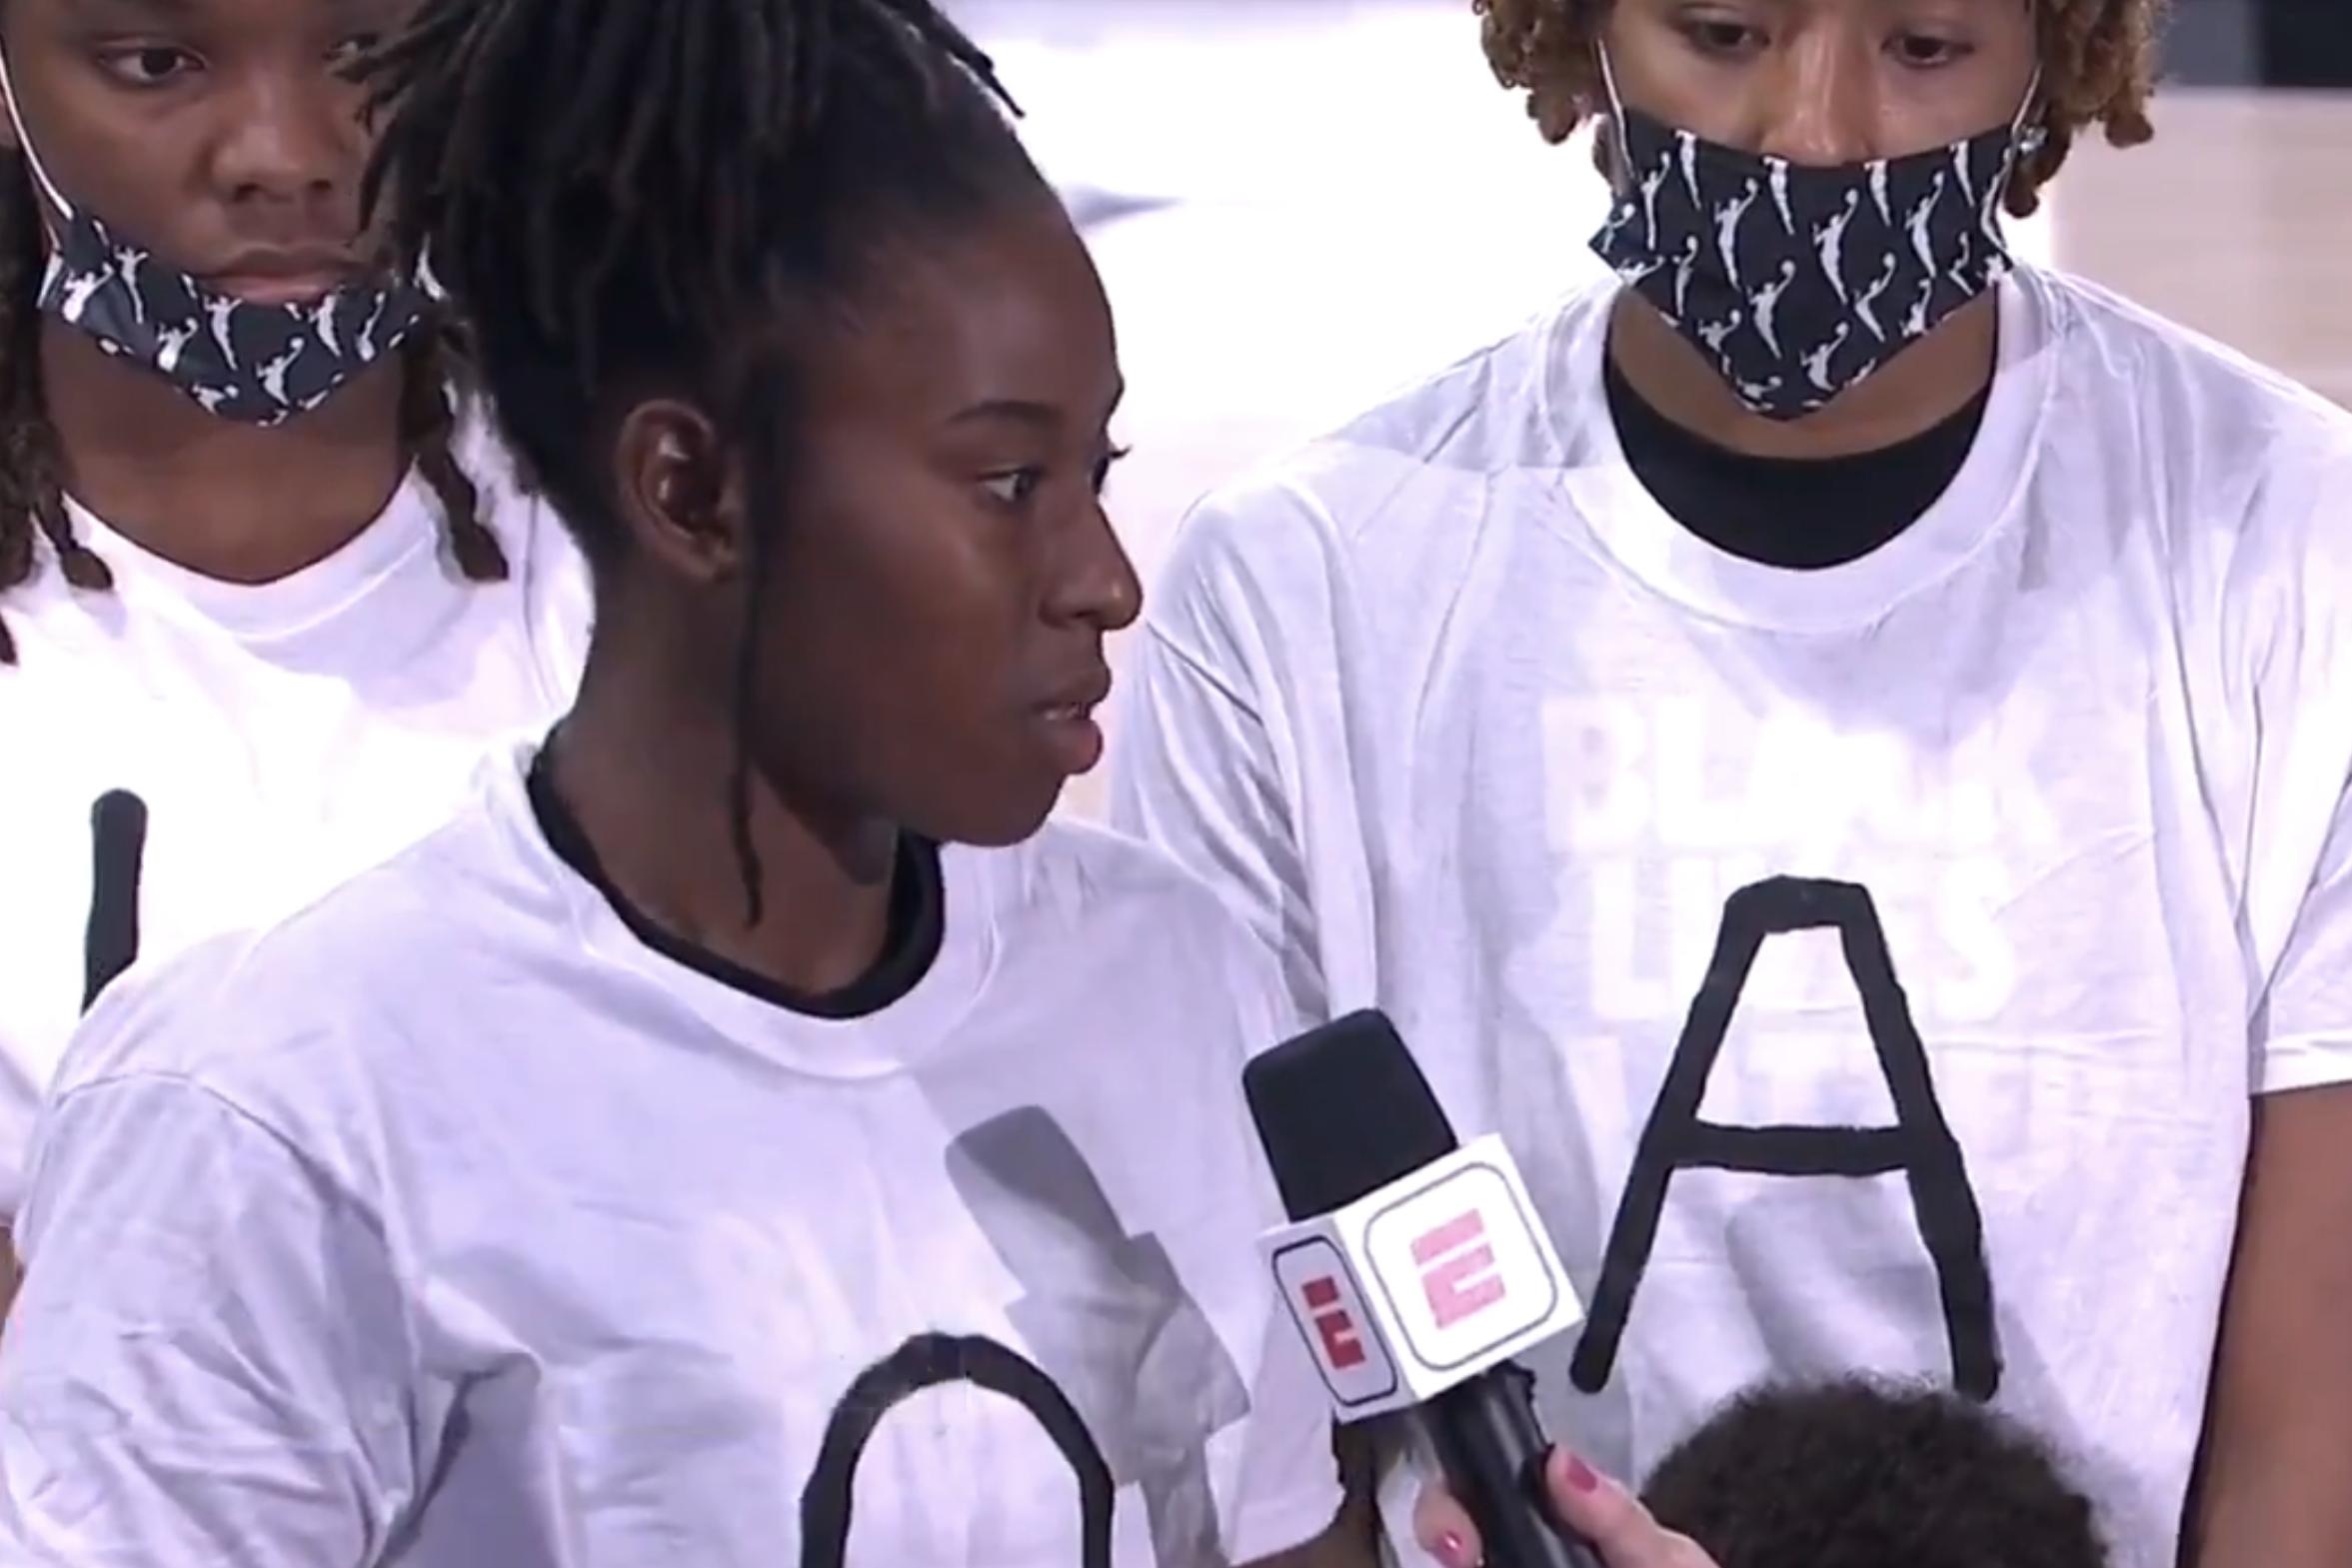 WNBA takes a stand